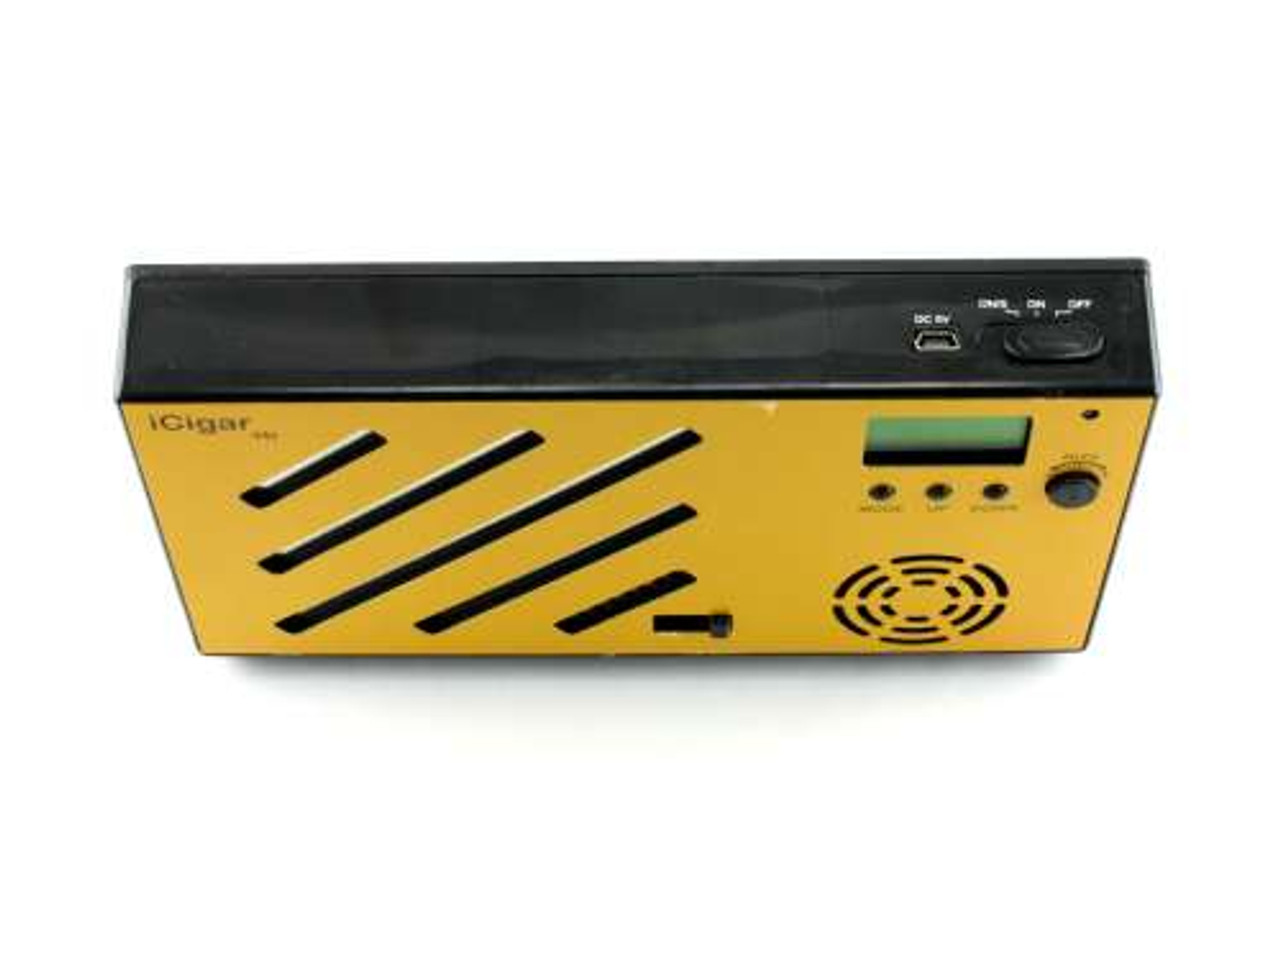 Le Veil Gold iCigar Hybrid Electronic Cigar Humidifier